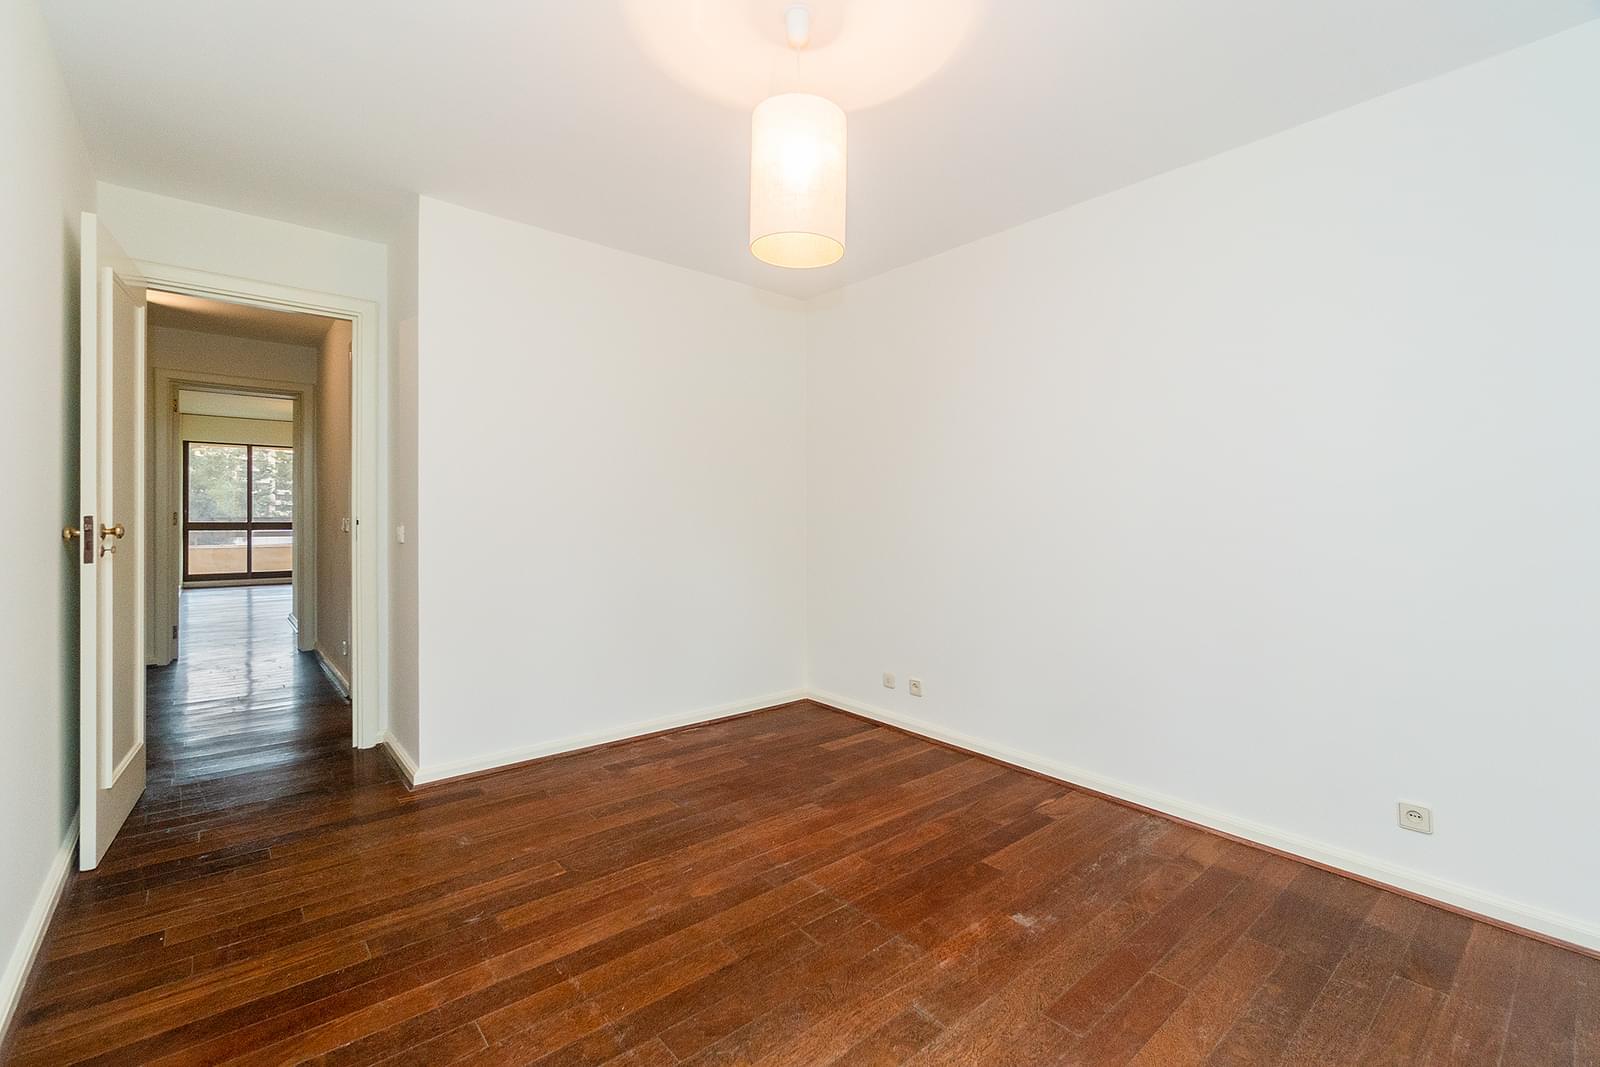 pf18551-apartamento-t3-1-lisboa-257aec40-bc74-45d3-ae78-57fa67bcb5ff